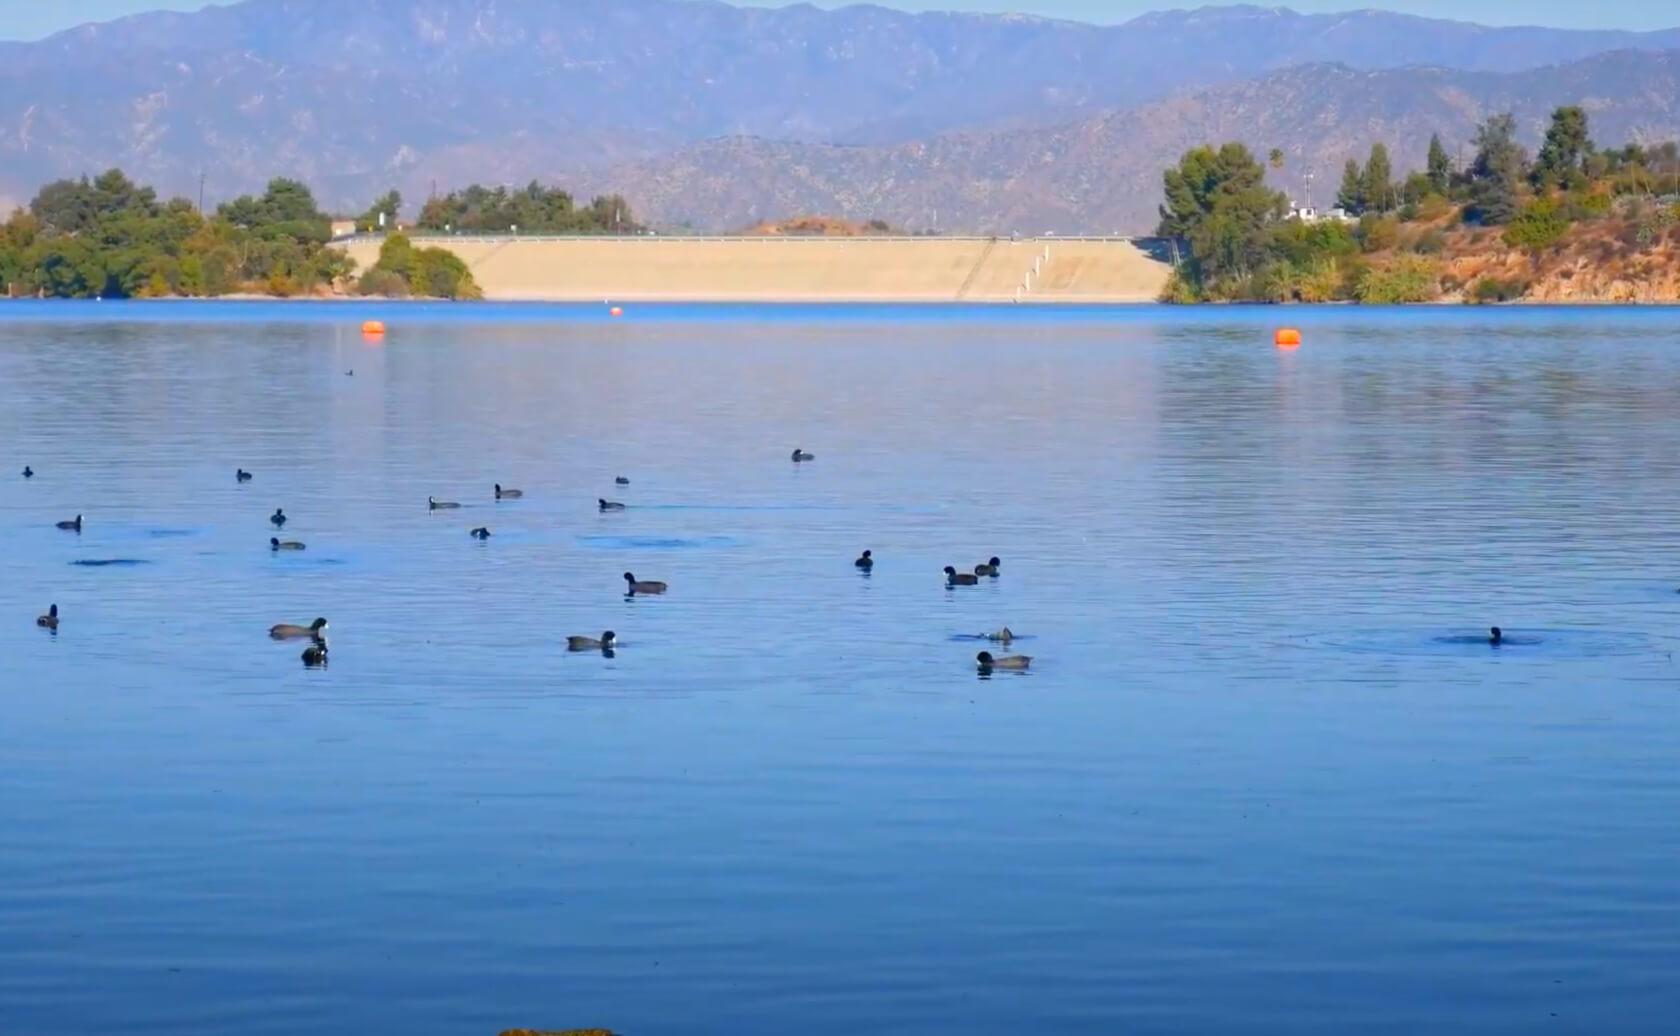 Puddingstone-Lake-Fishing-Guide-Report-California-07